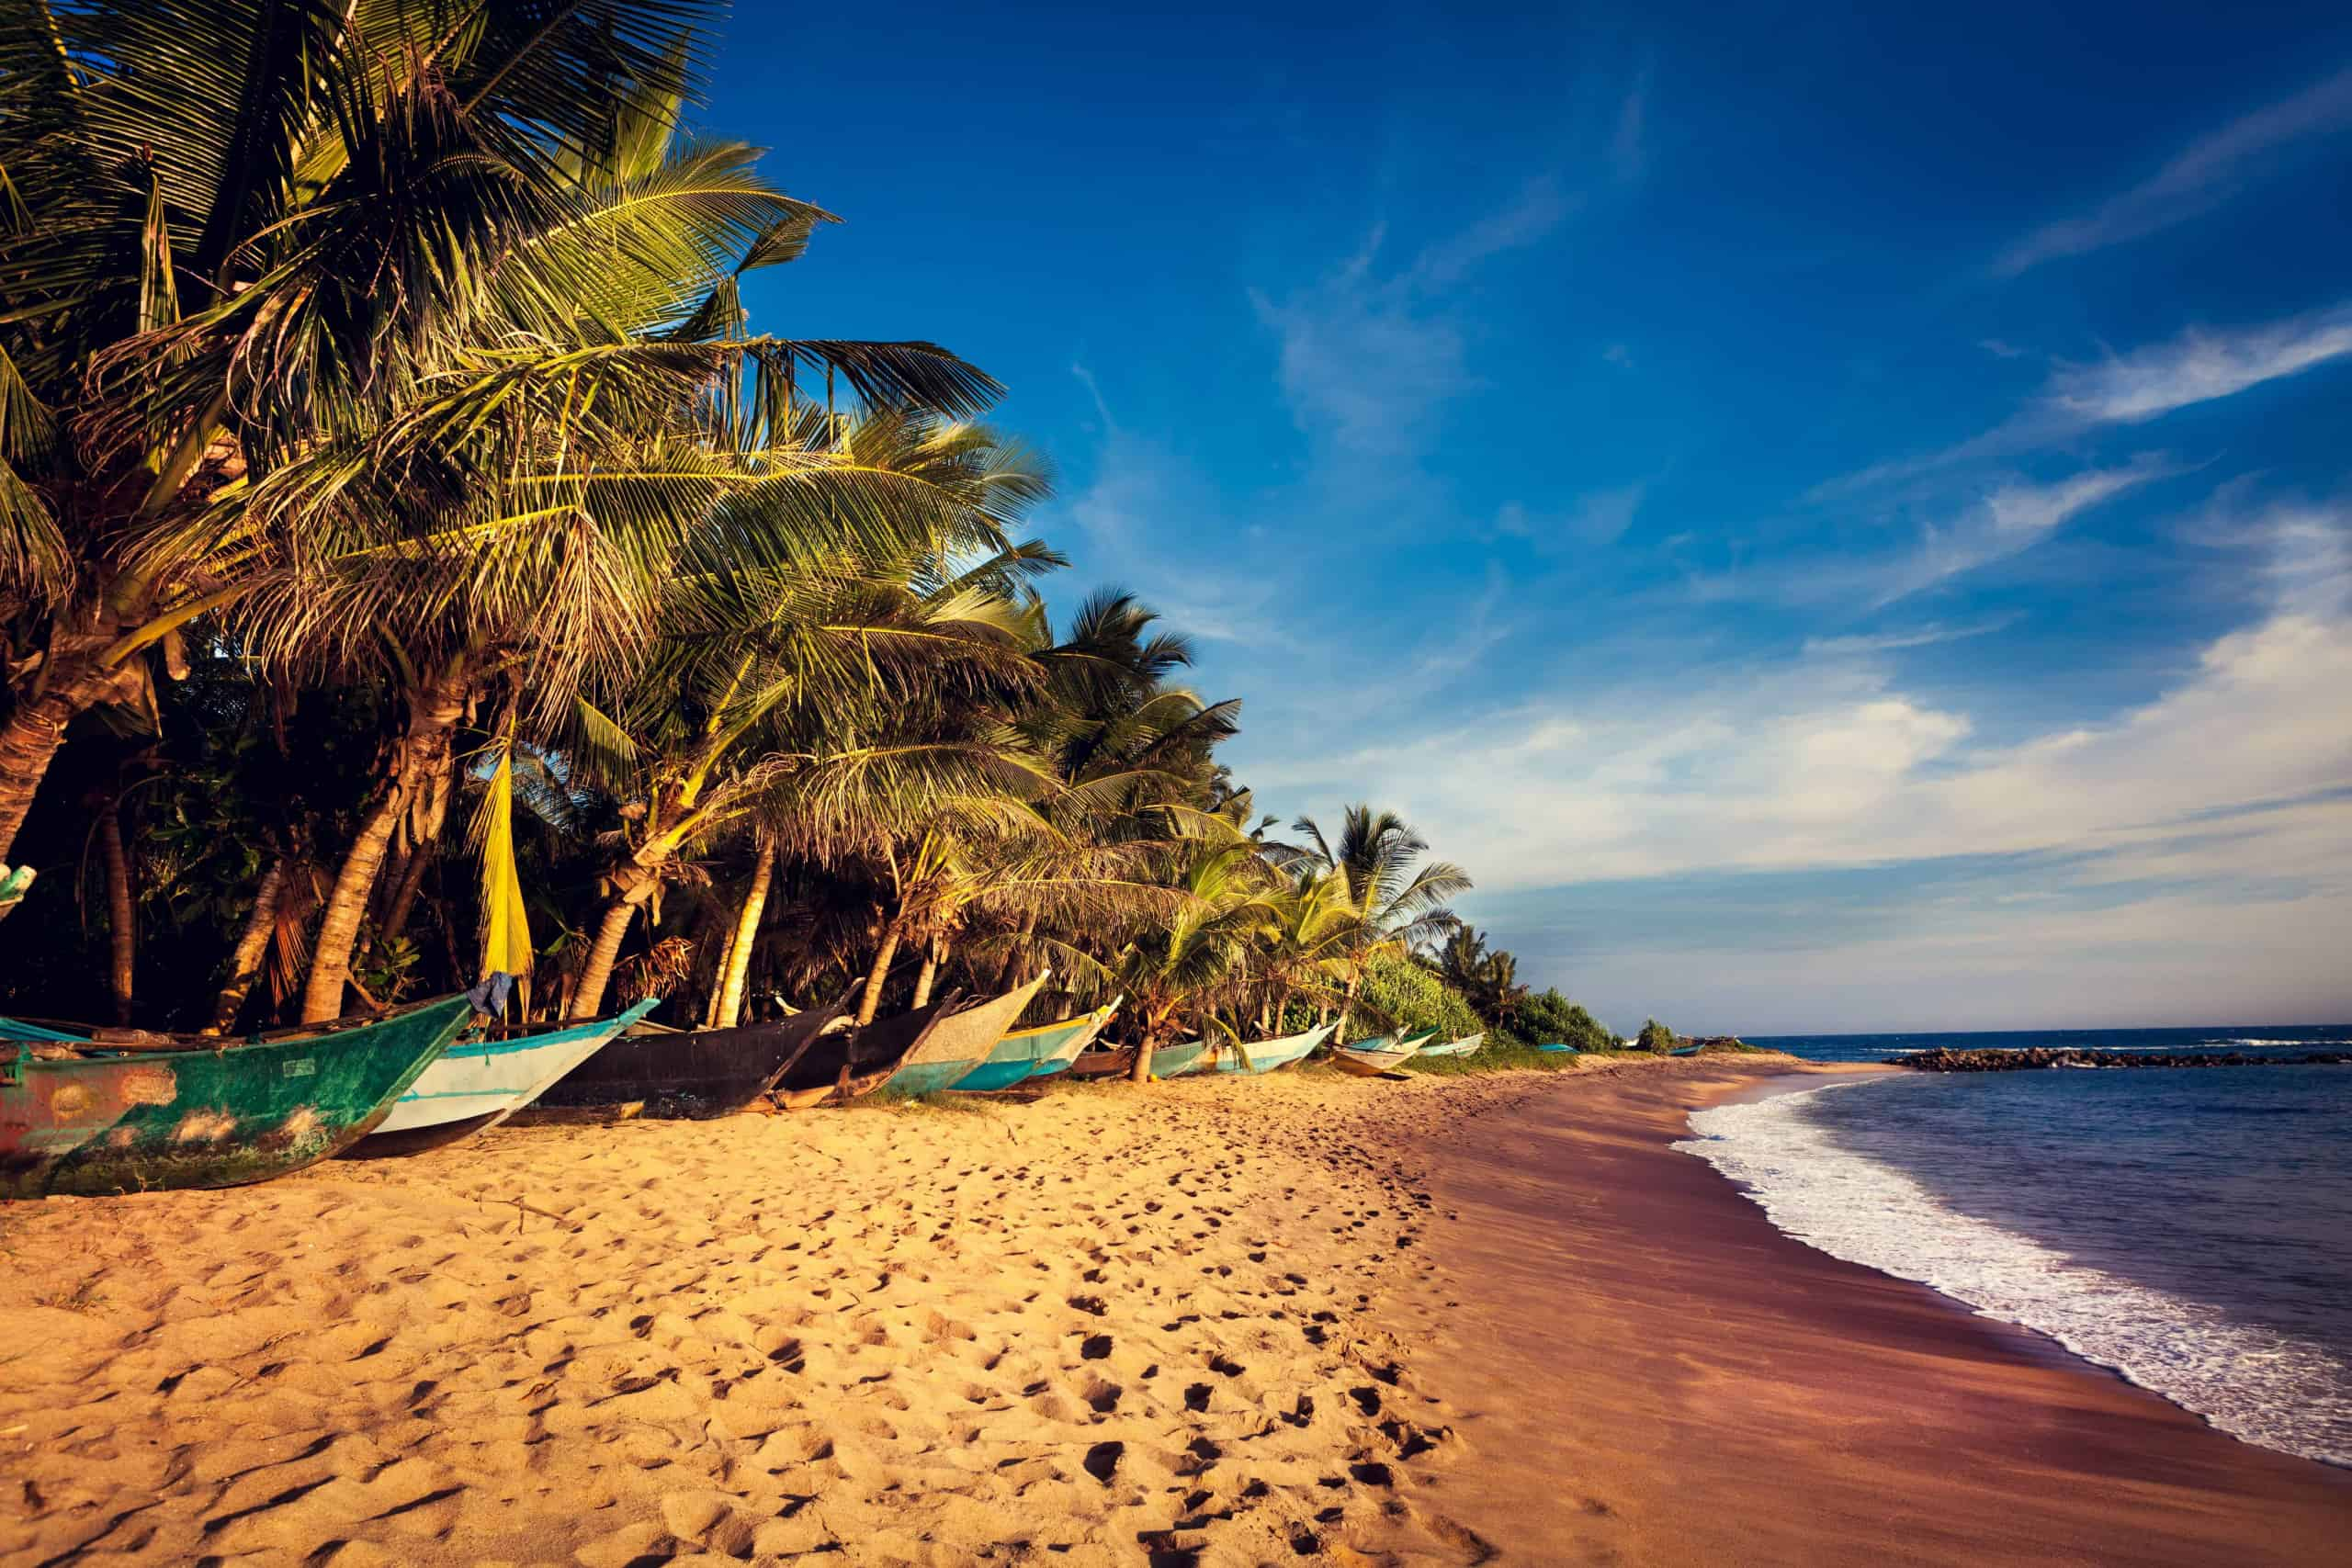 Sri Lanka - Weather, Landmarks, Old Towns, History | Tourism